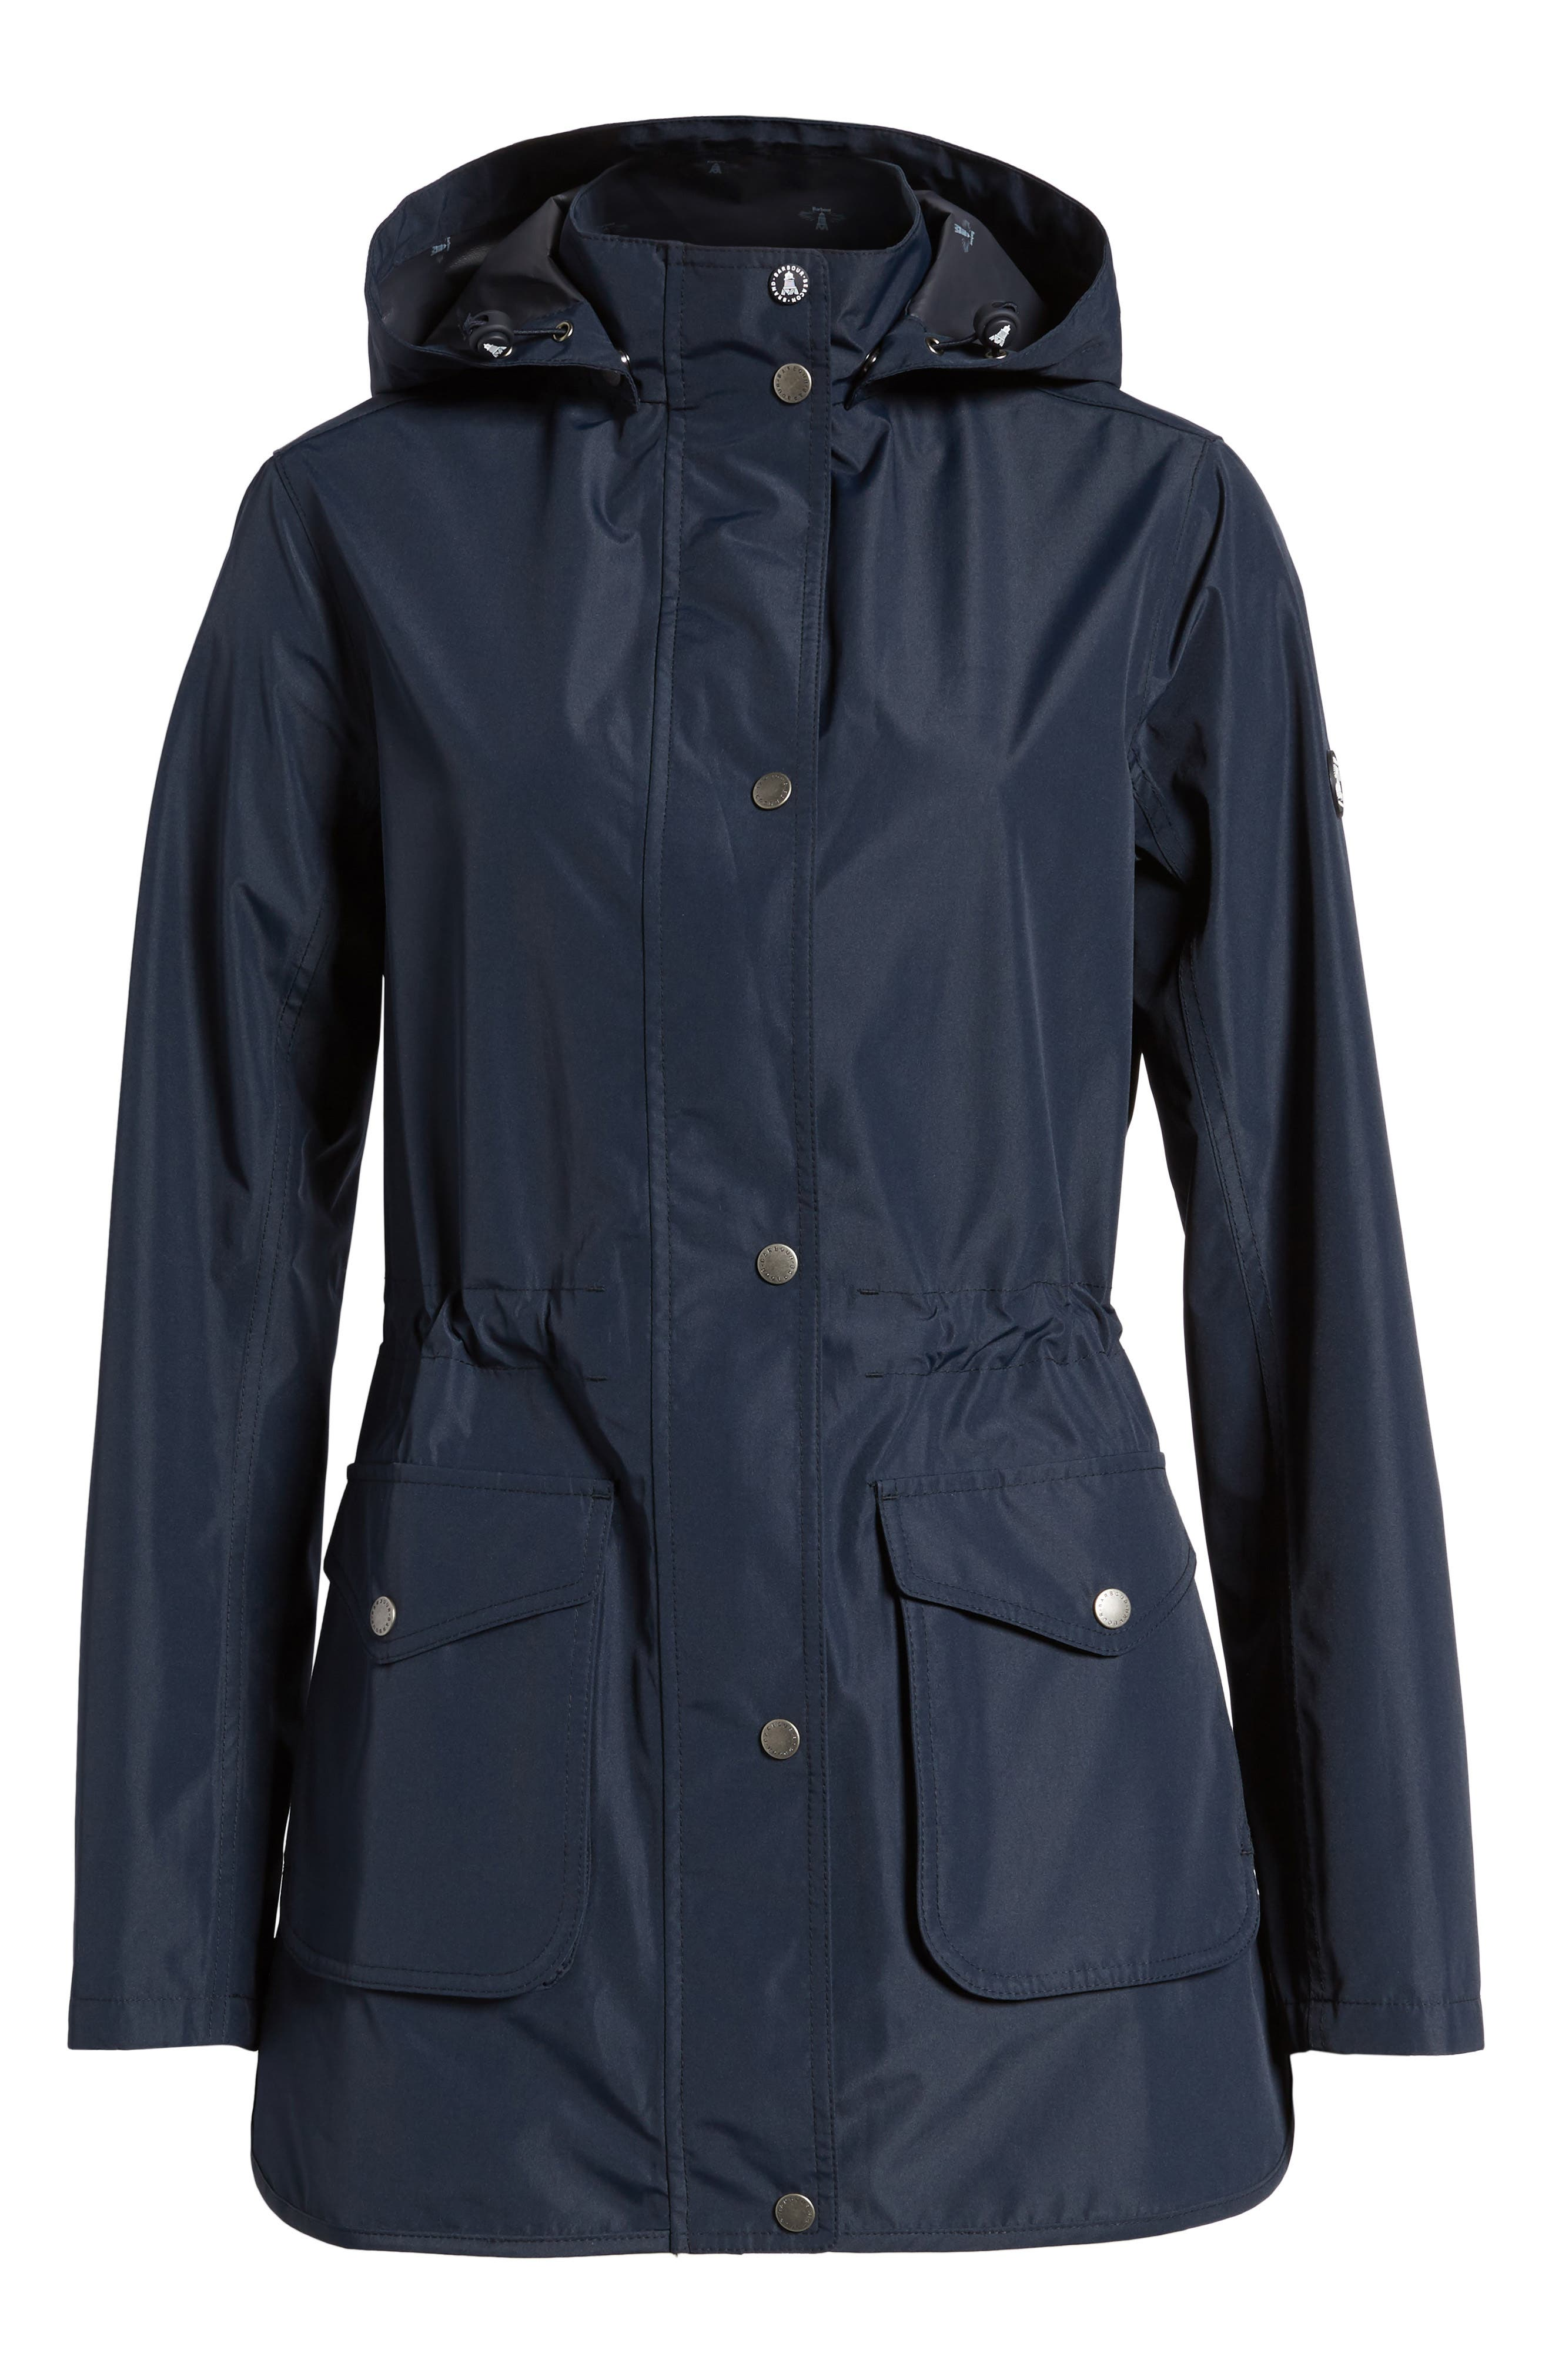 Studland Waterproof Jacket,                             Alternate thumbnail 6, color,                             Navy